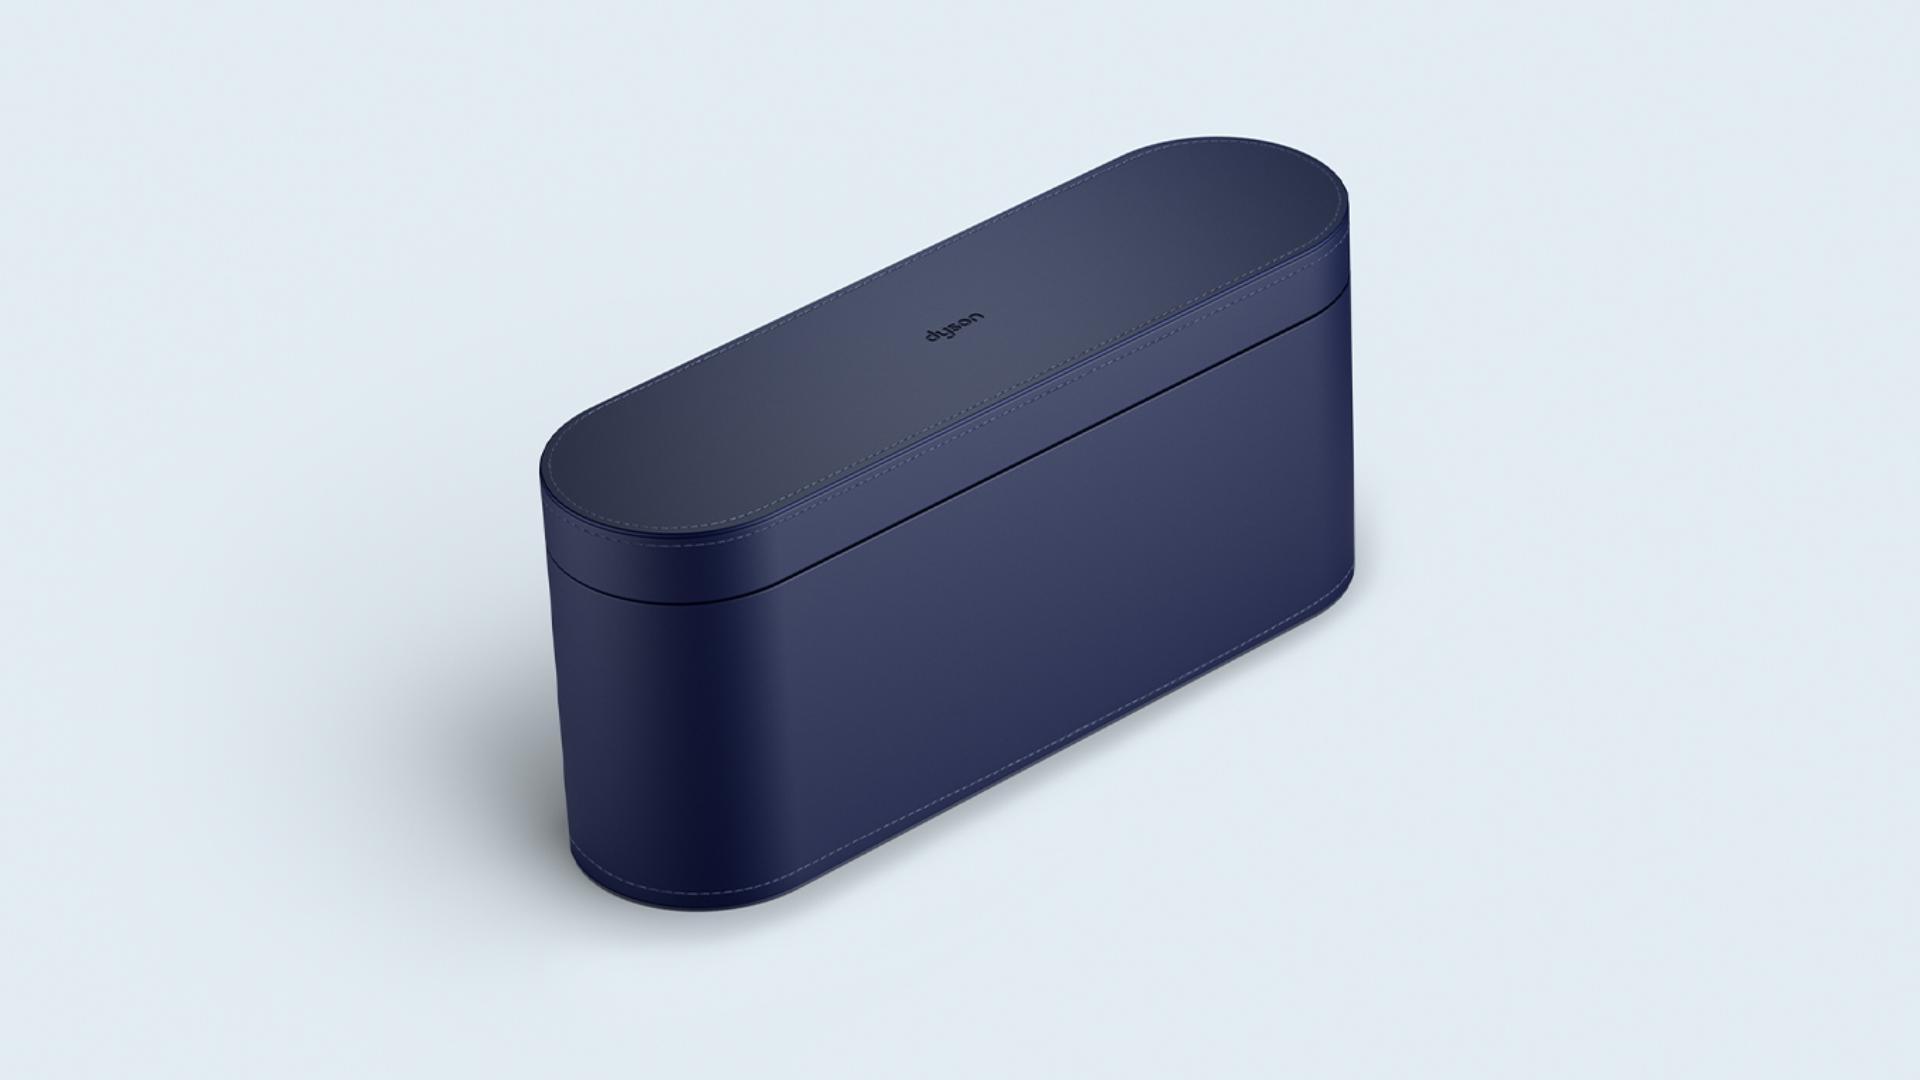 Dyson-designed presentation case